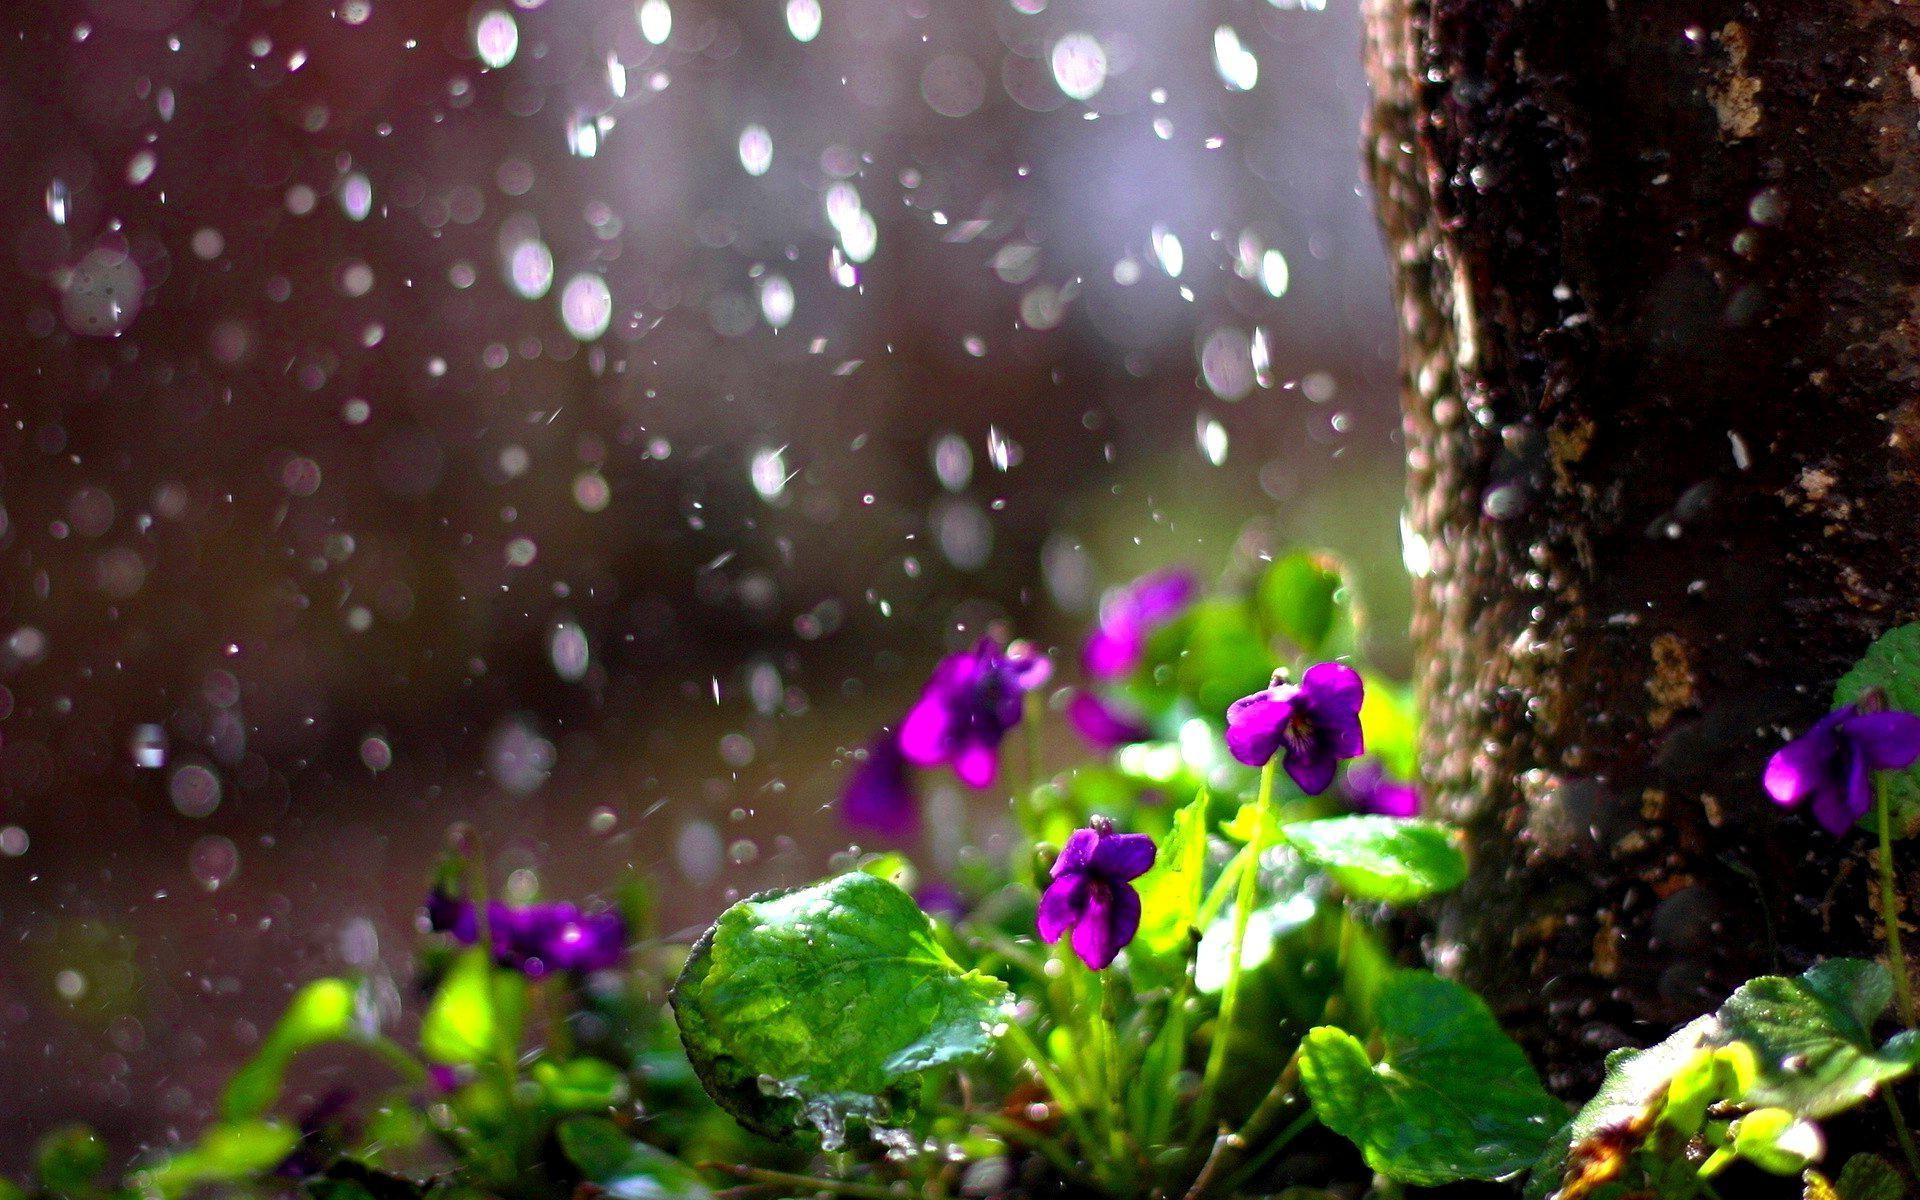 Spring Rain Wallpaper For Desktop 69 Images